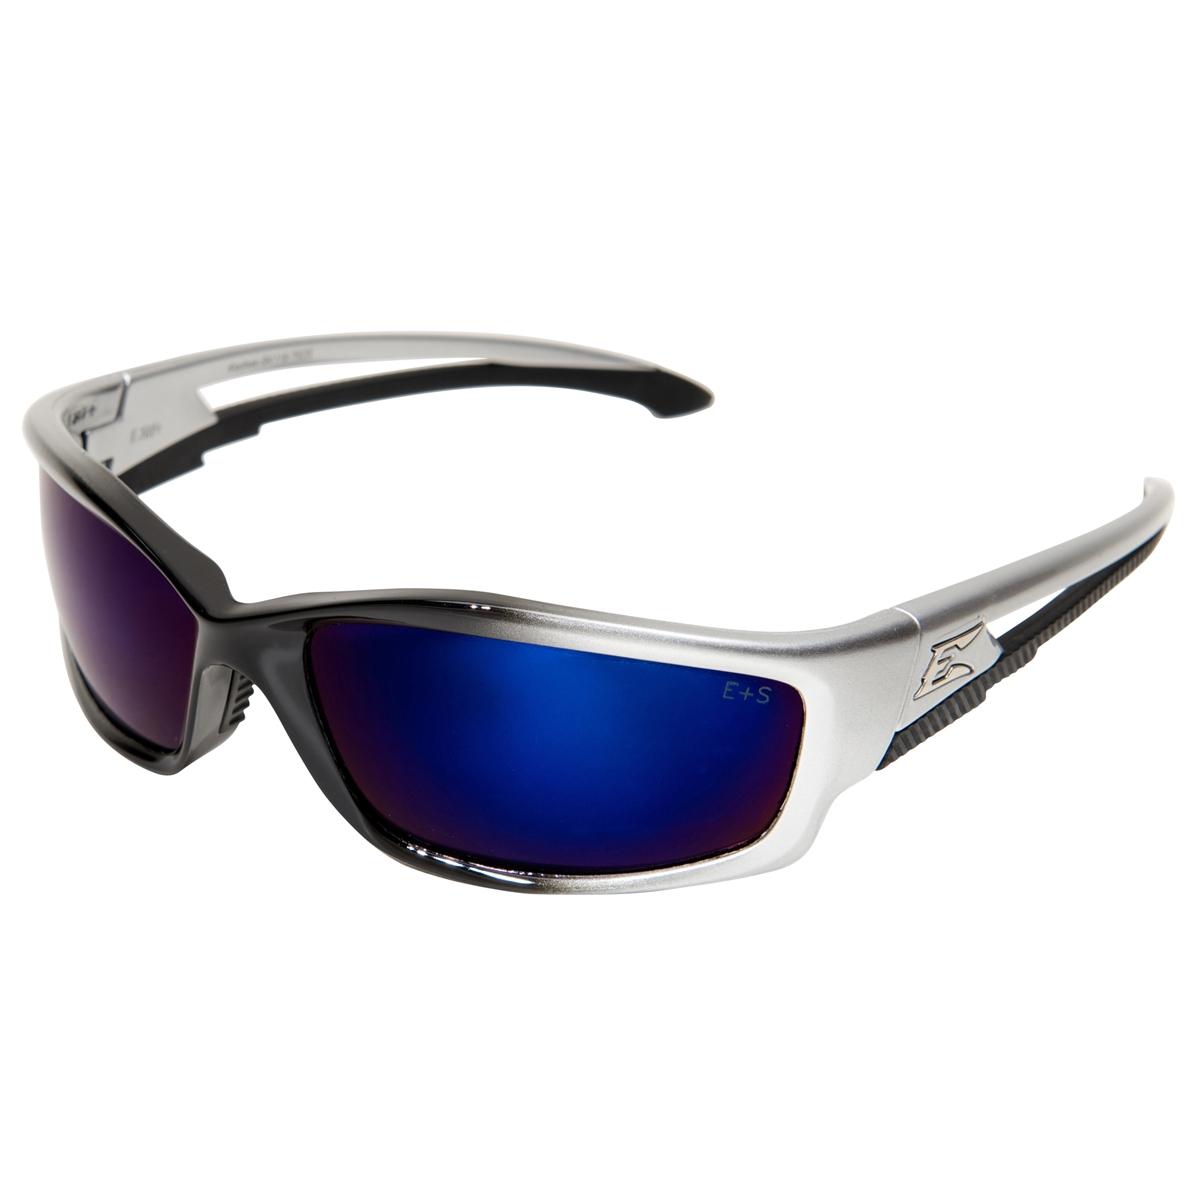 Edge Safety Glasses Amazon